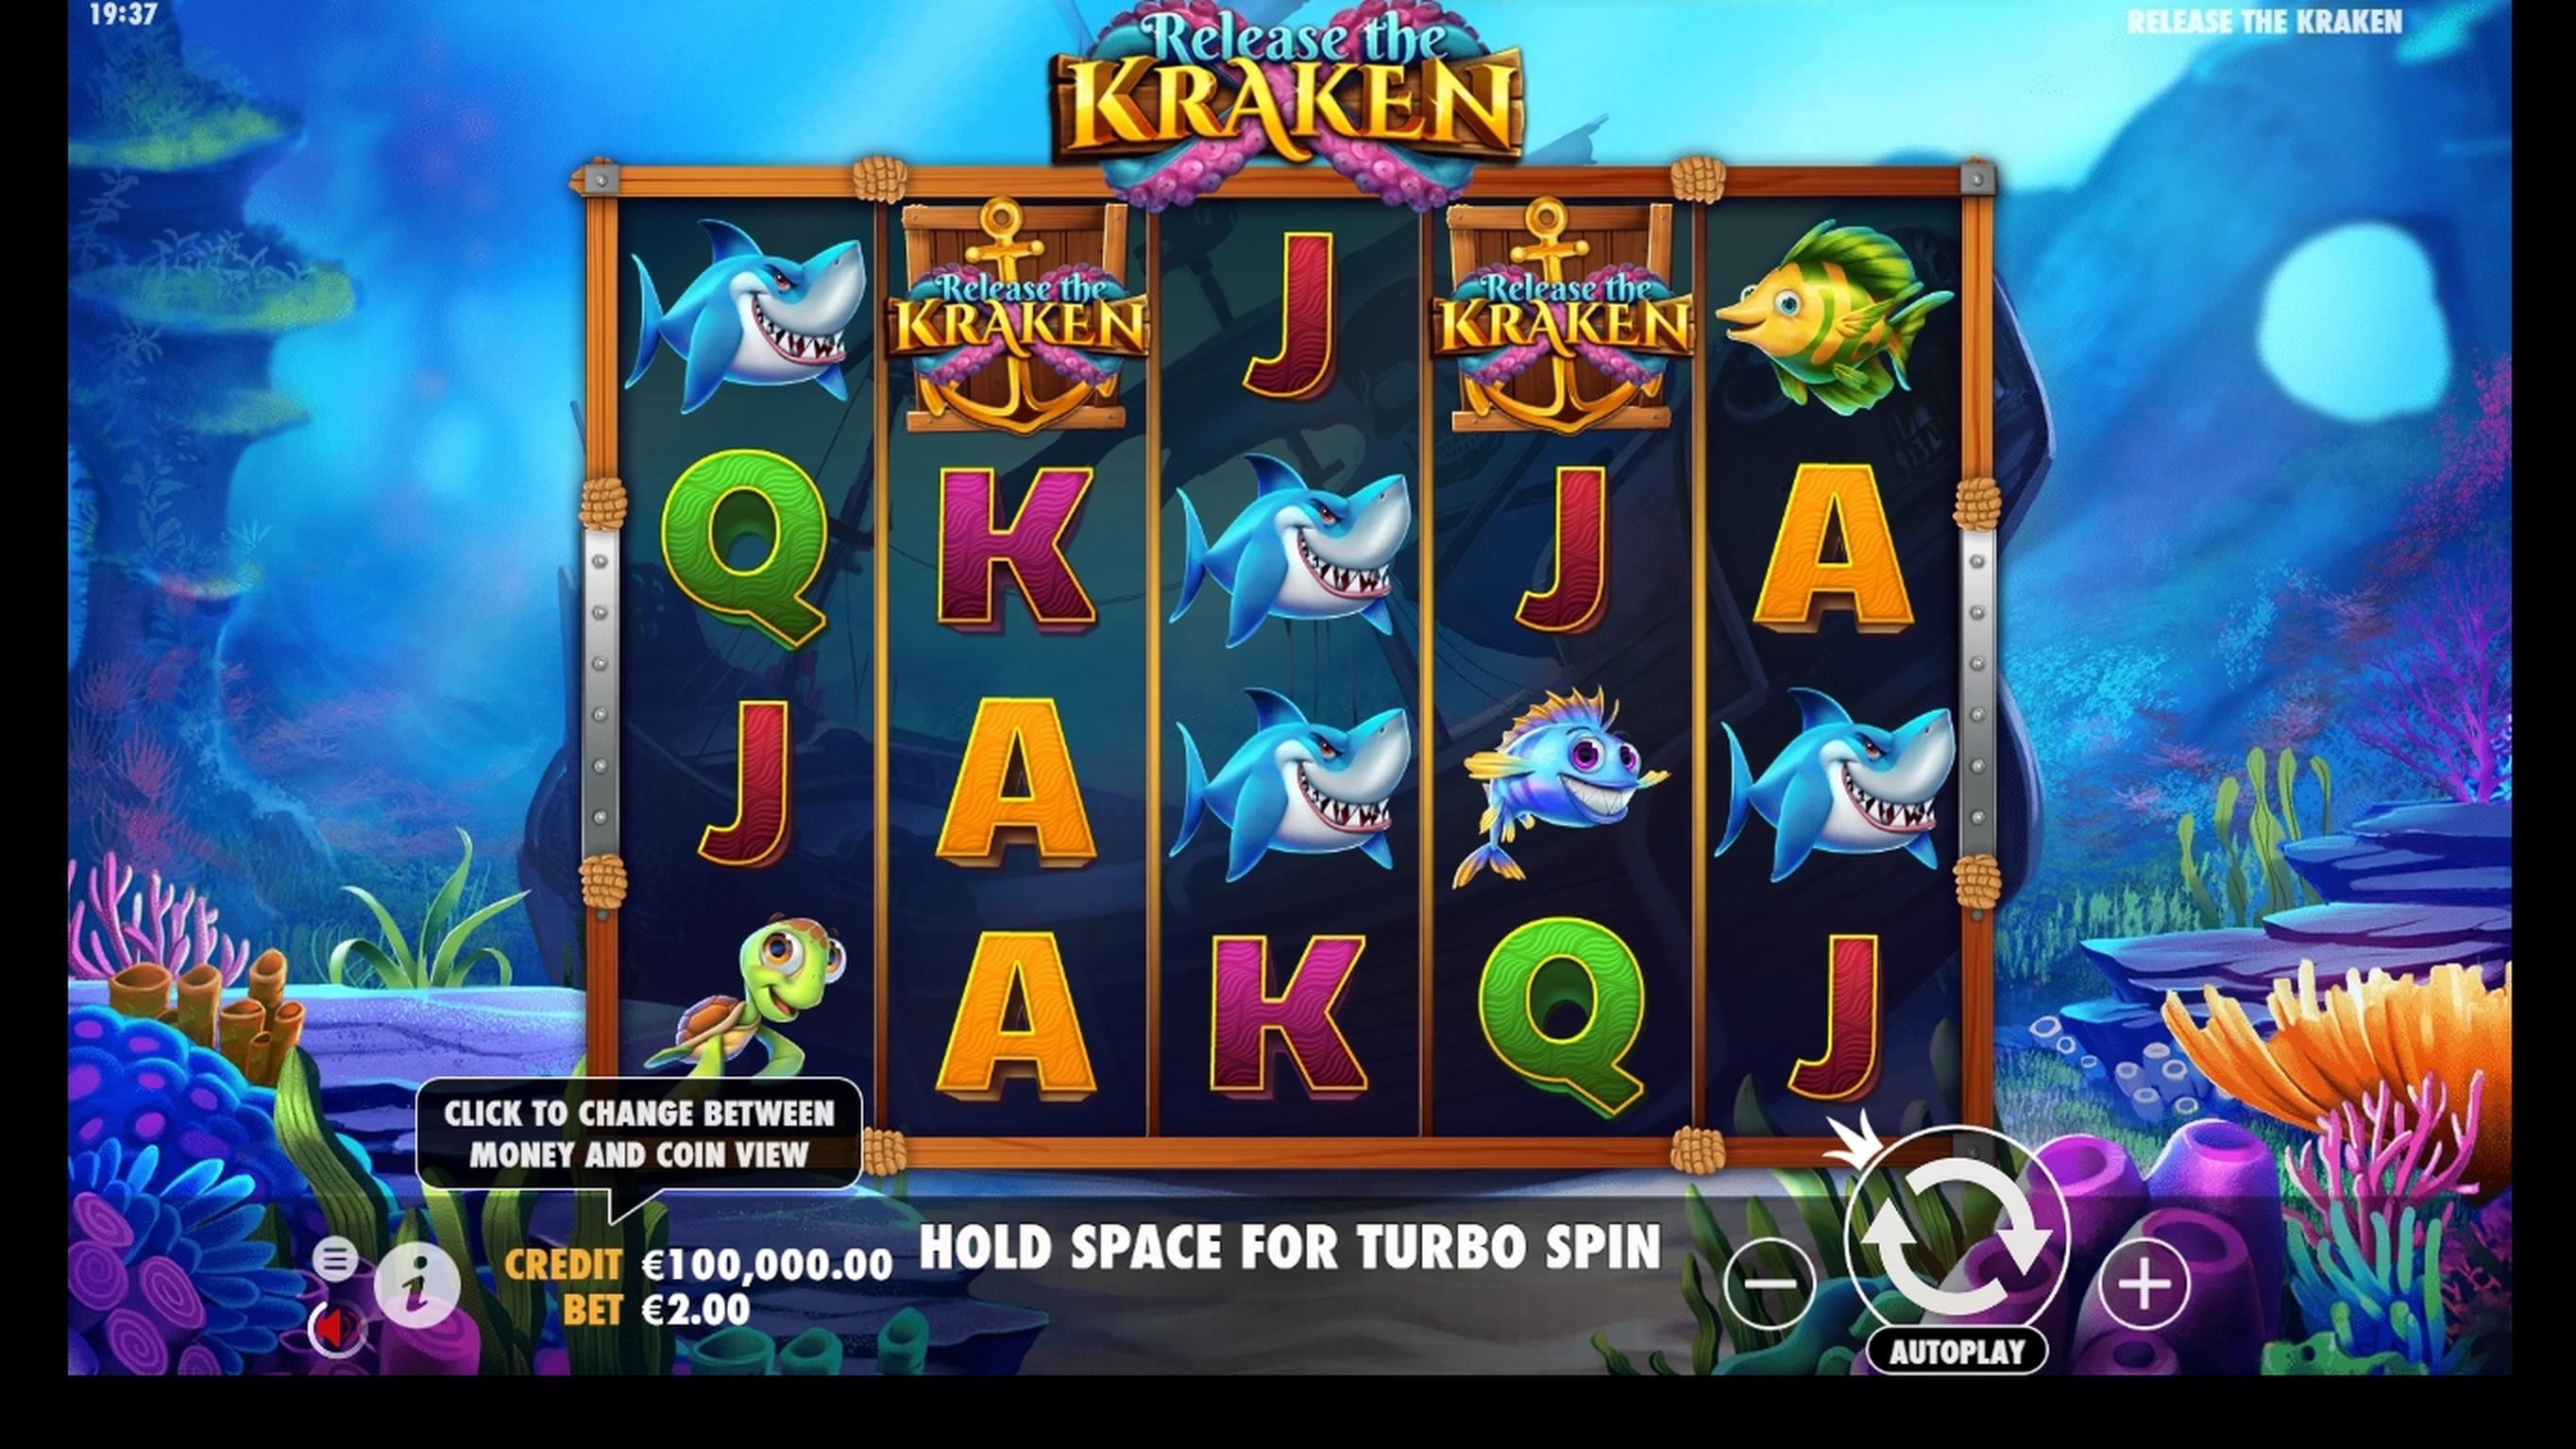 Play The No Download Demo Of Eye Of The Kraken Slot Machine